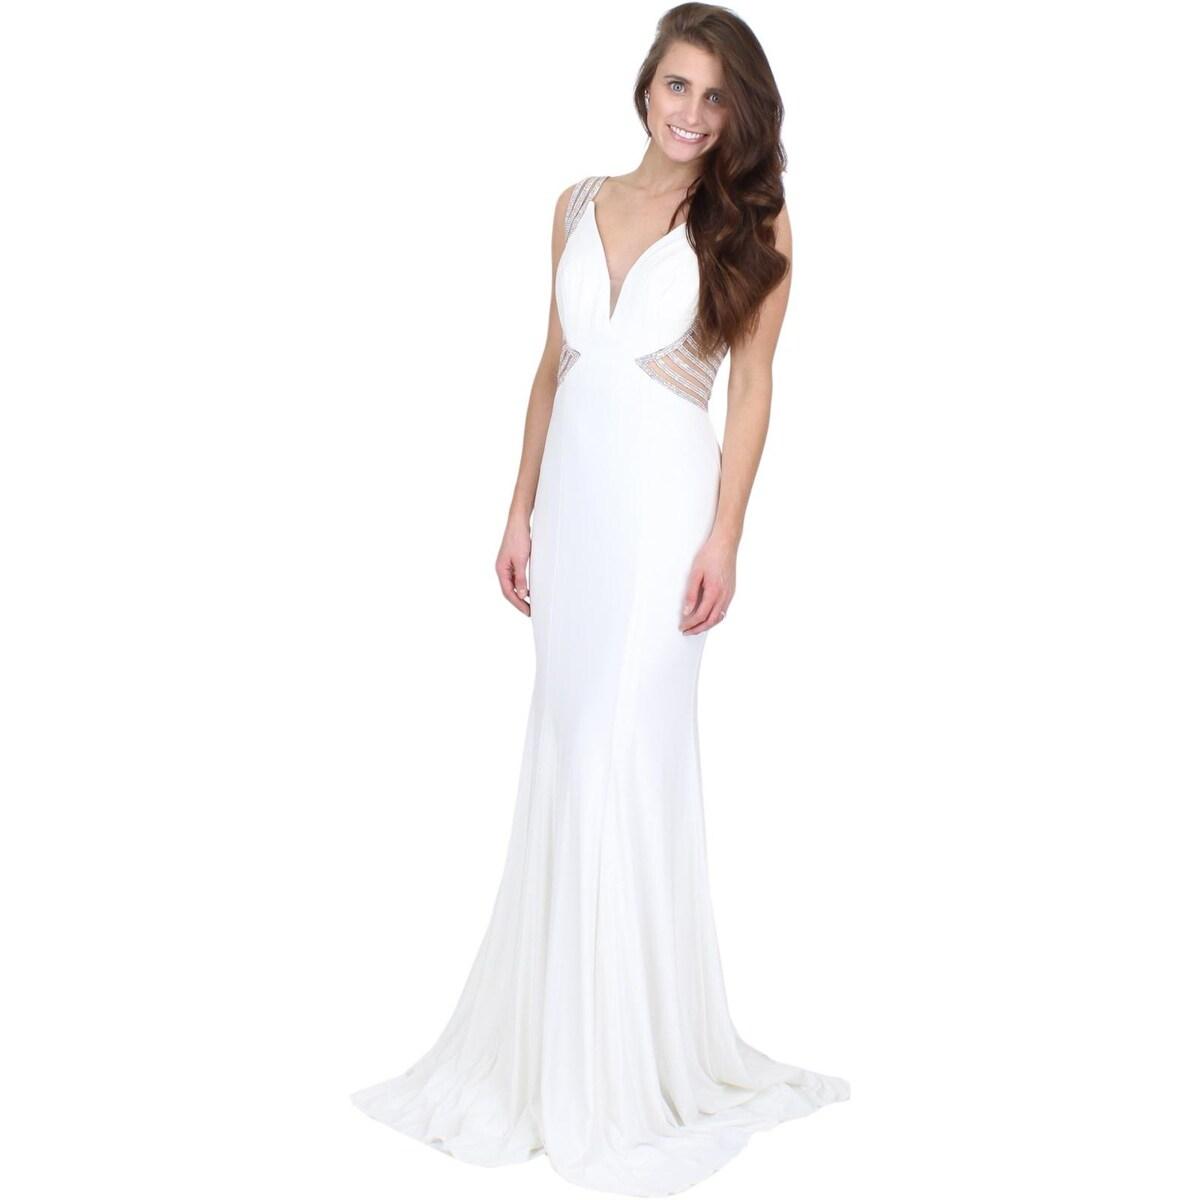 f9e7bd38b7288 Jovani Wedding Dress Reviews - raveitsafe